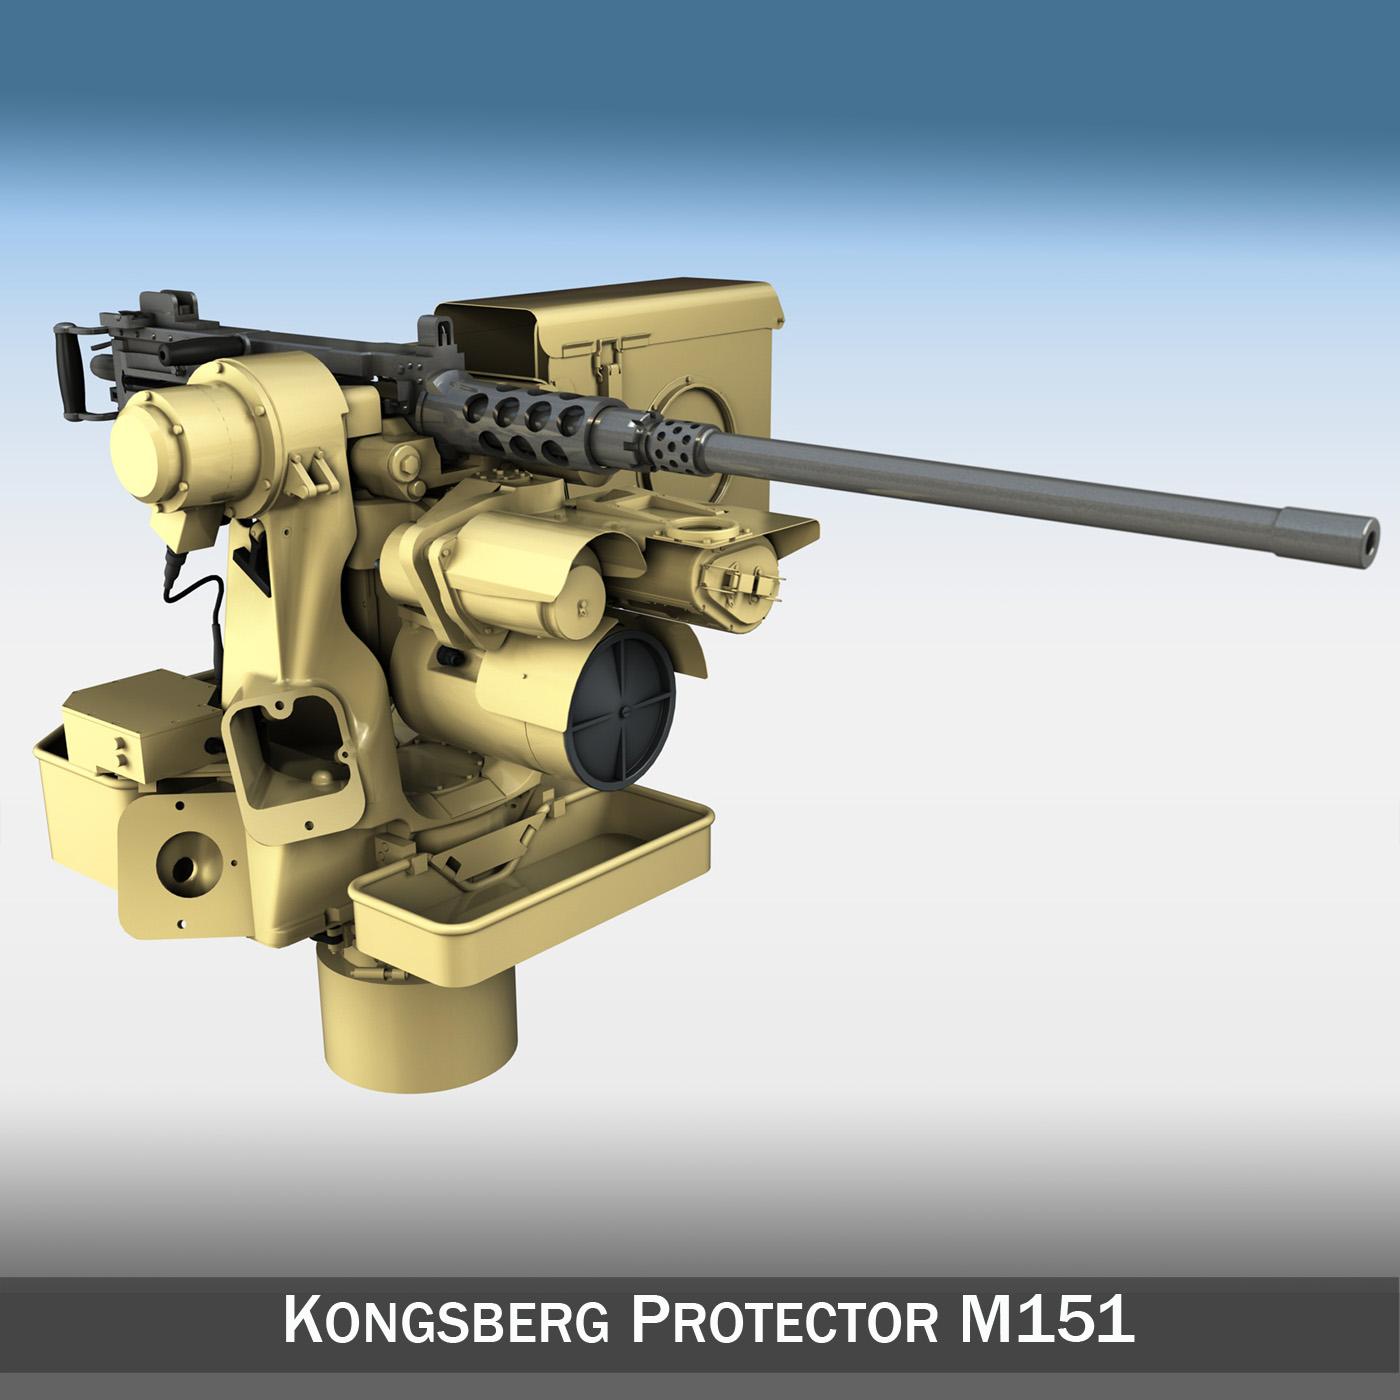 kongsberg protector m151 rws 3d model 3ds c4d lwo obj 264098